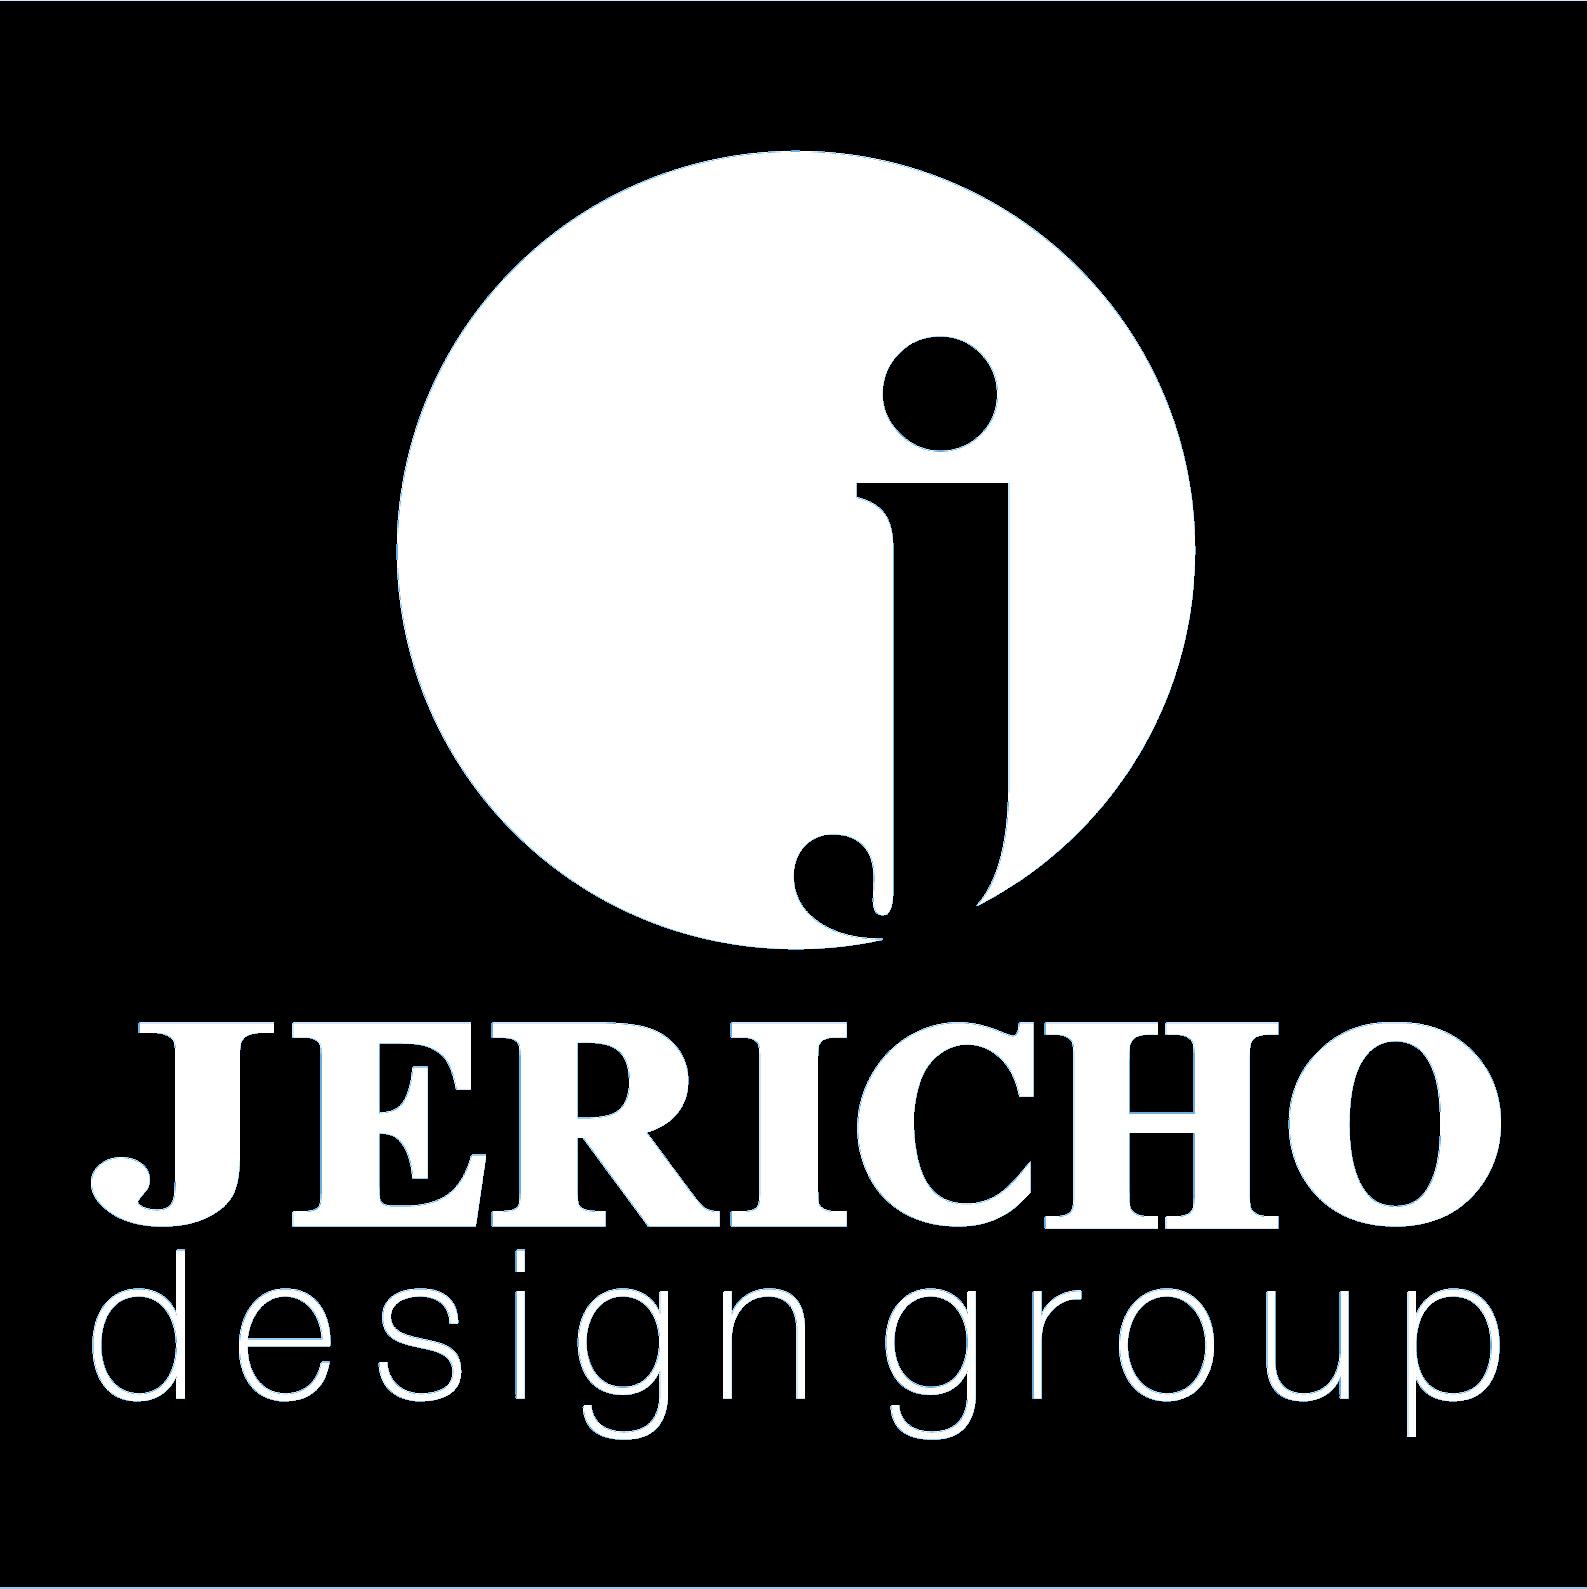 Jericho Design